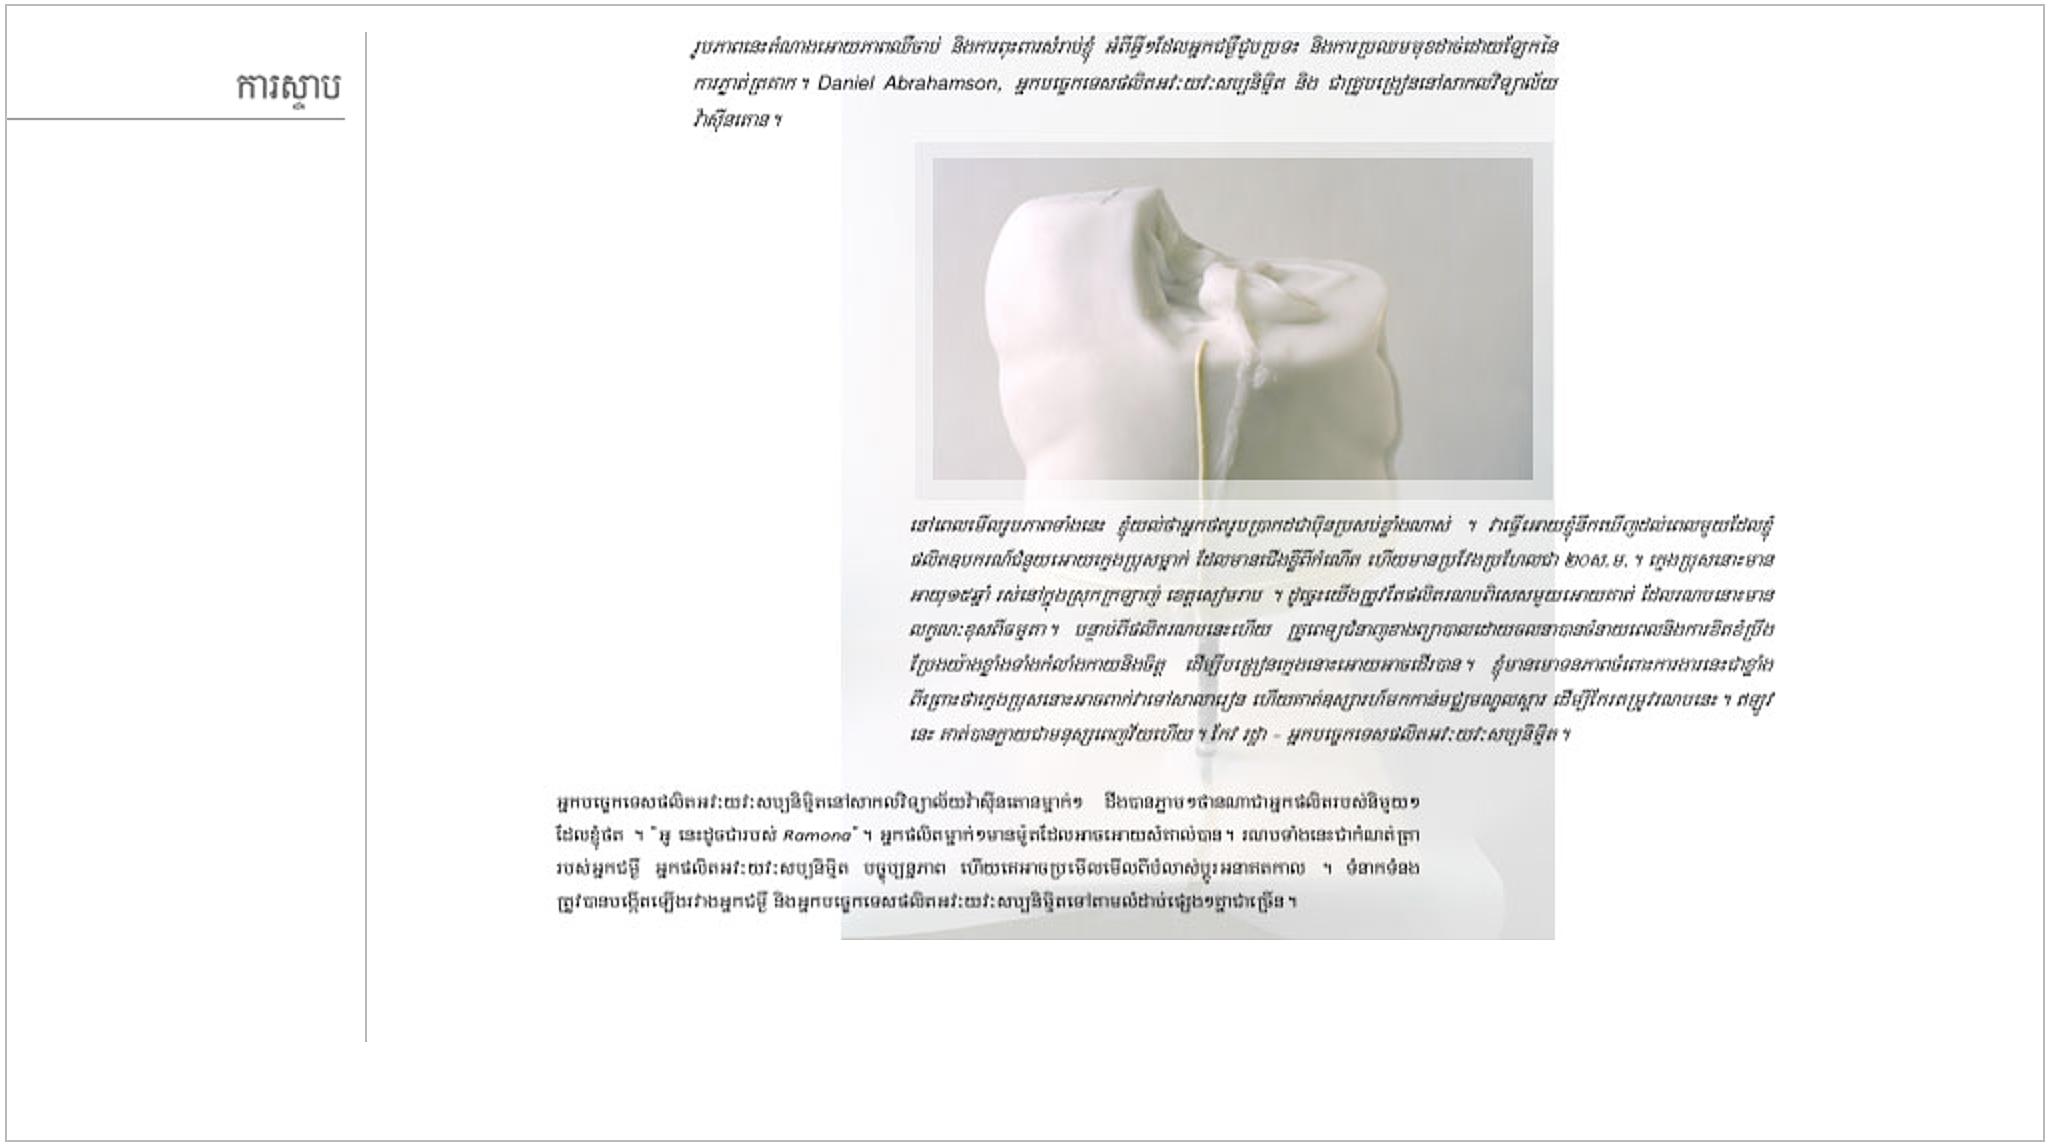 pg 47 copy.jpg